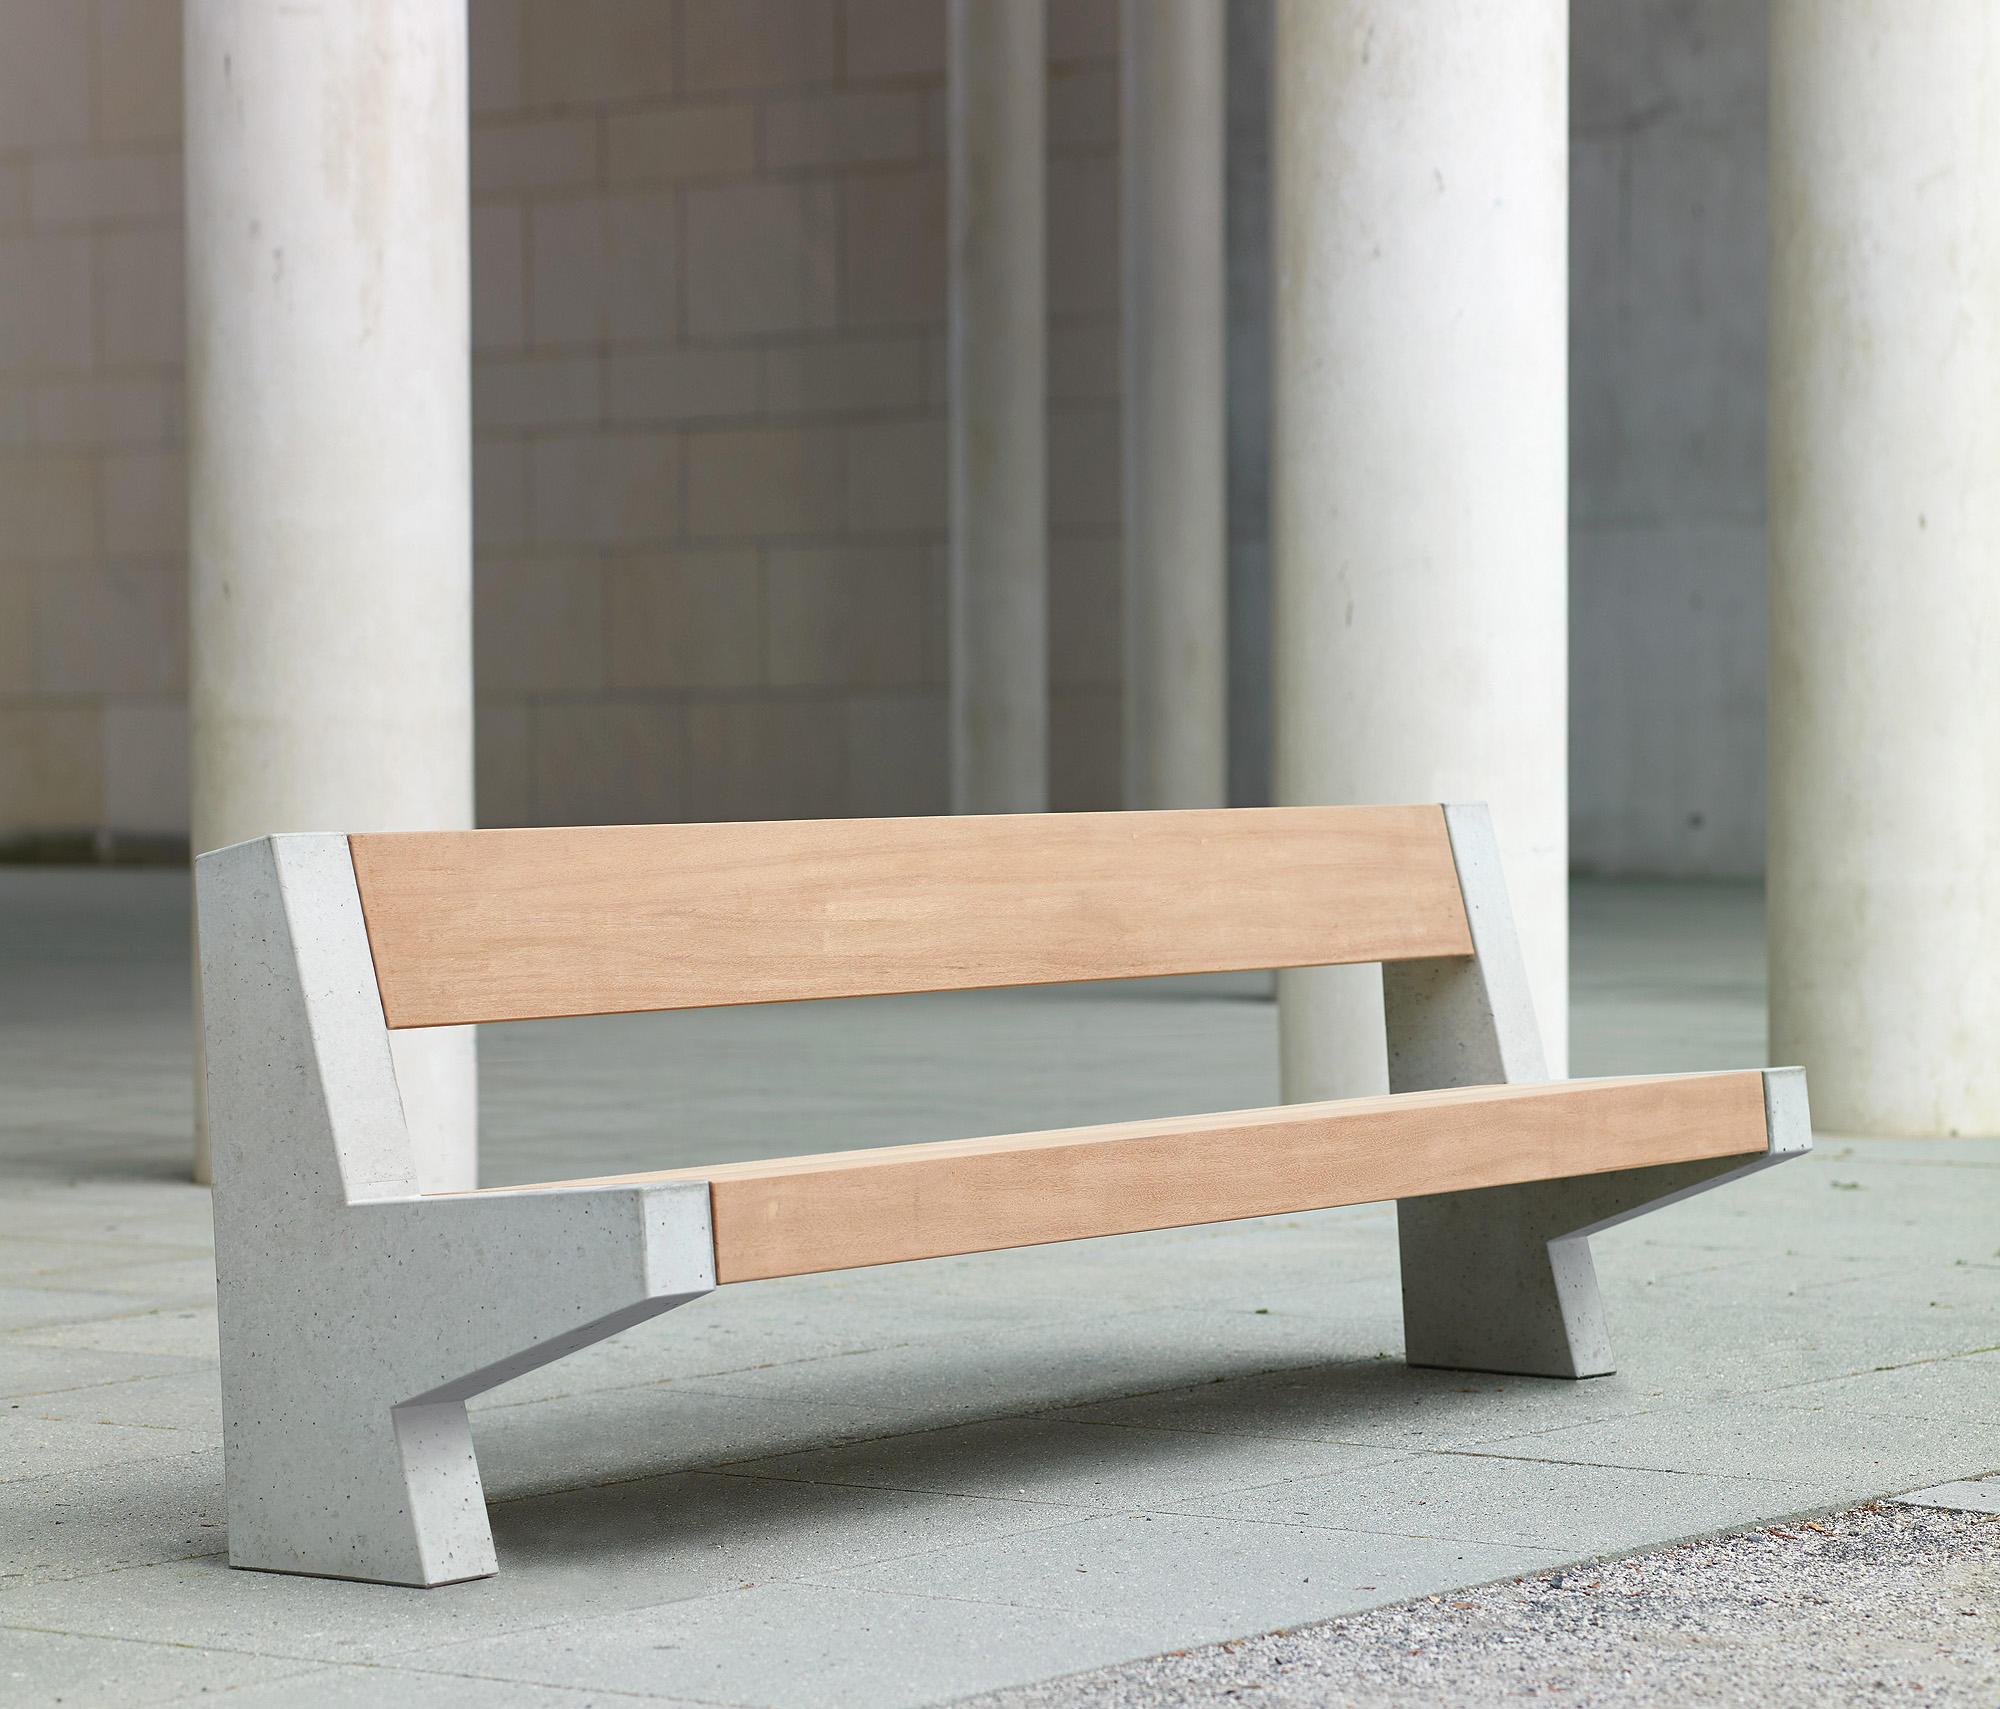 Tremendous Versio Juno Bench With Slats Large Concrete Feet Light Grey Beatyapartments Chair Design Images Beatyapartmentscom